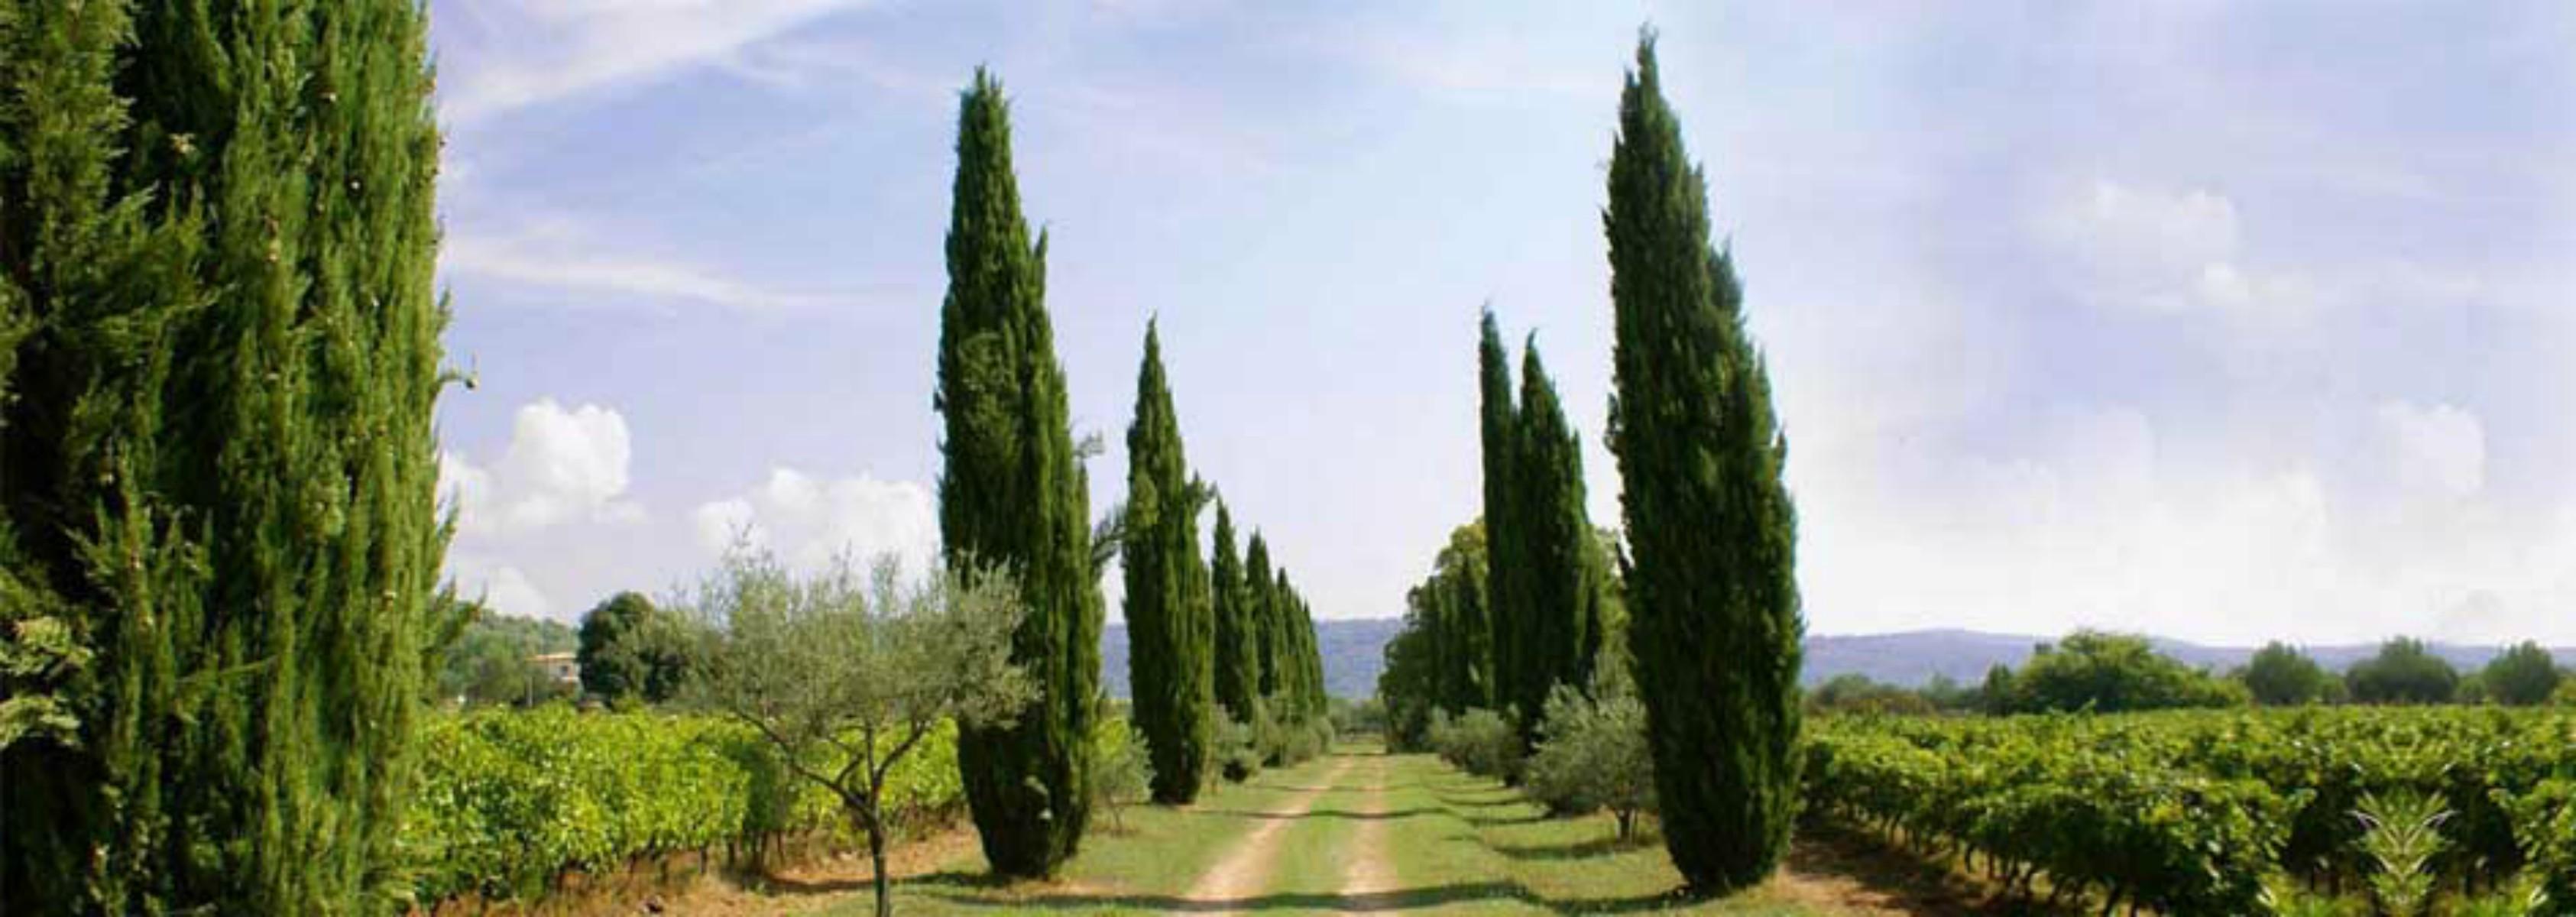 Domaine de Valcolombe